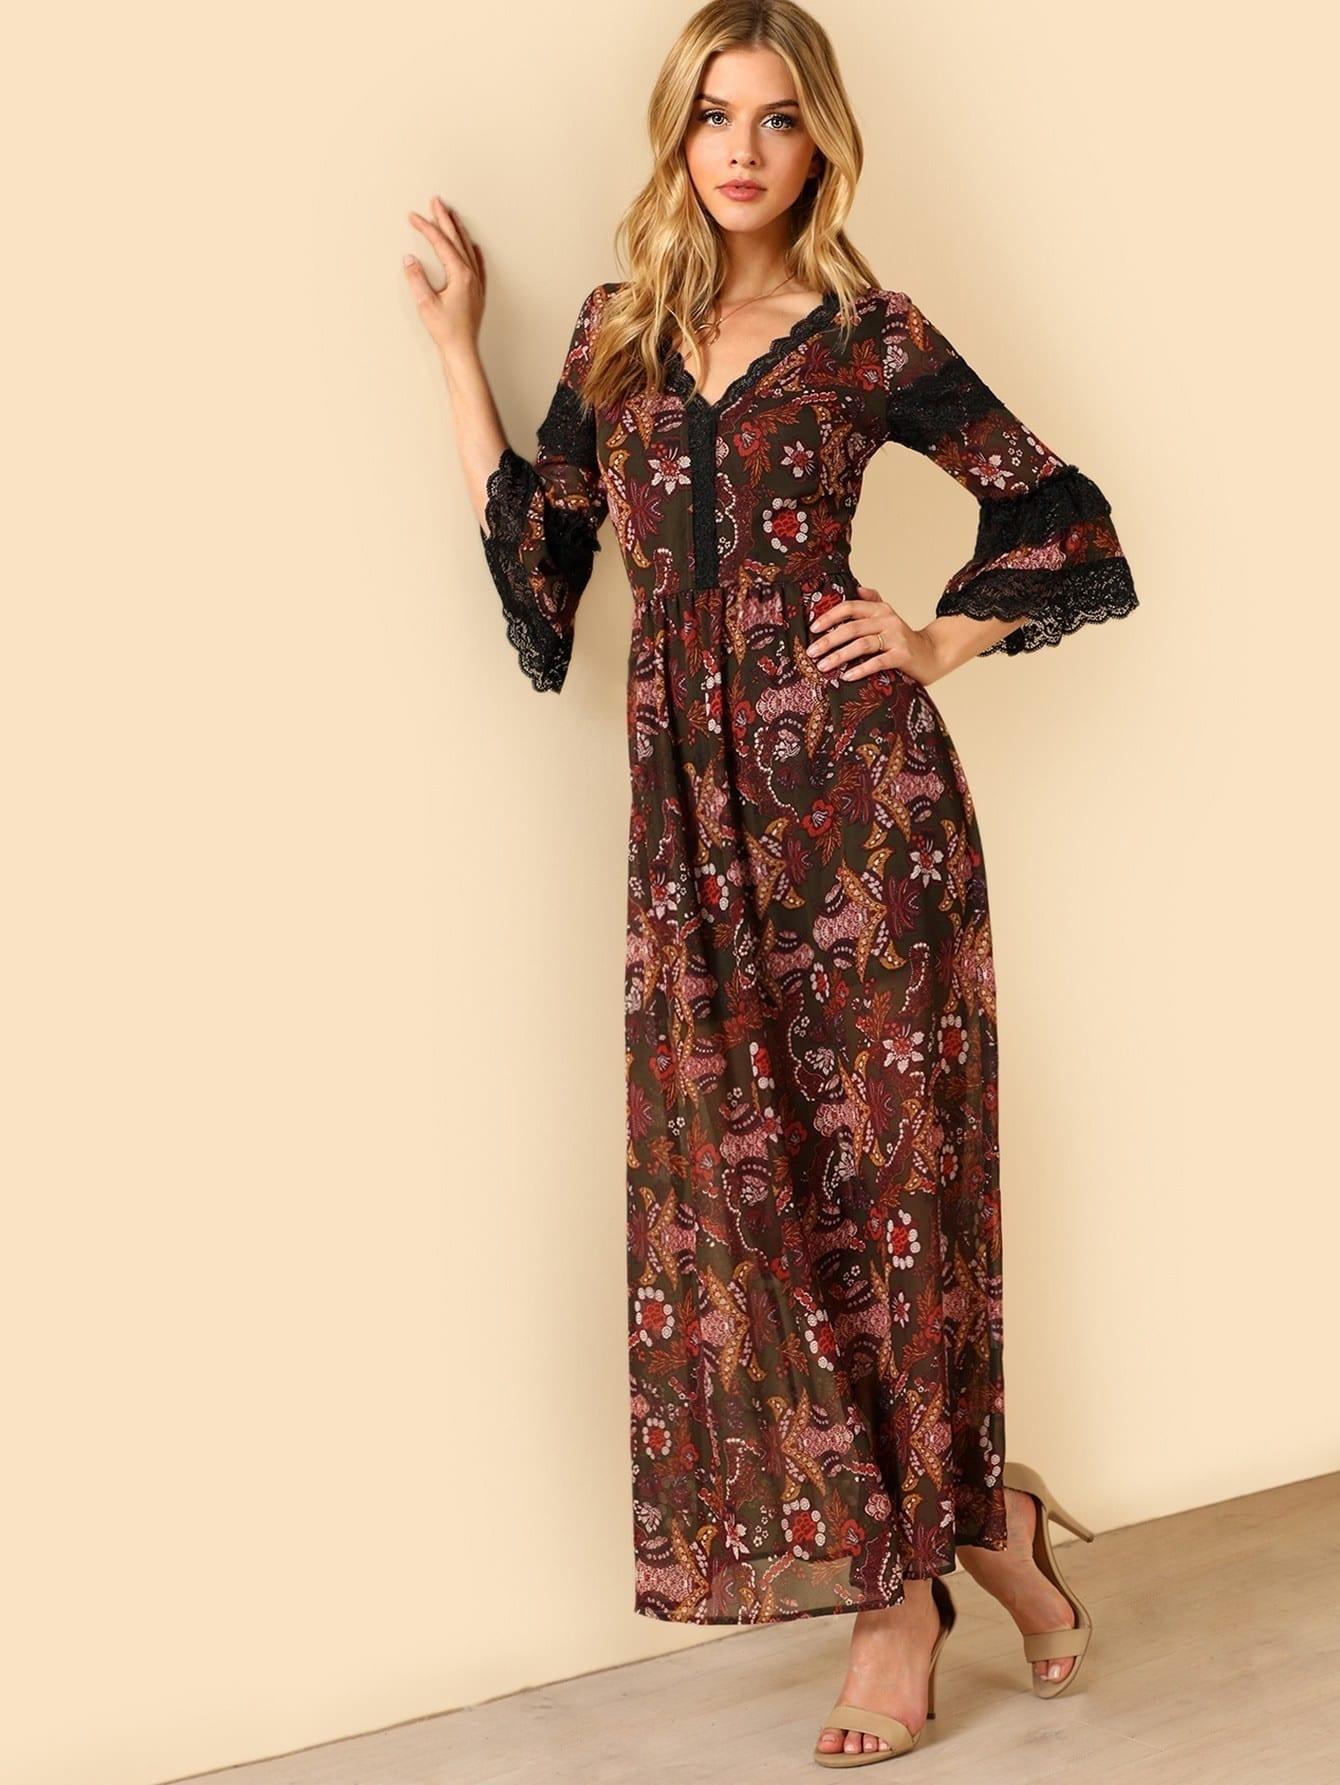 Lace Inset Flounce Sleeve Maxi Dress sanctuary new tan long sleeve lace inset tee xs $49 dbfl